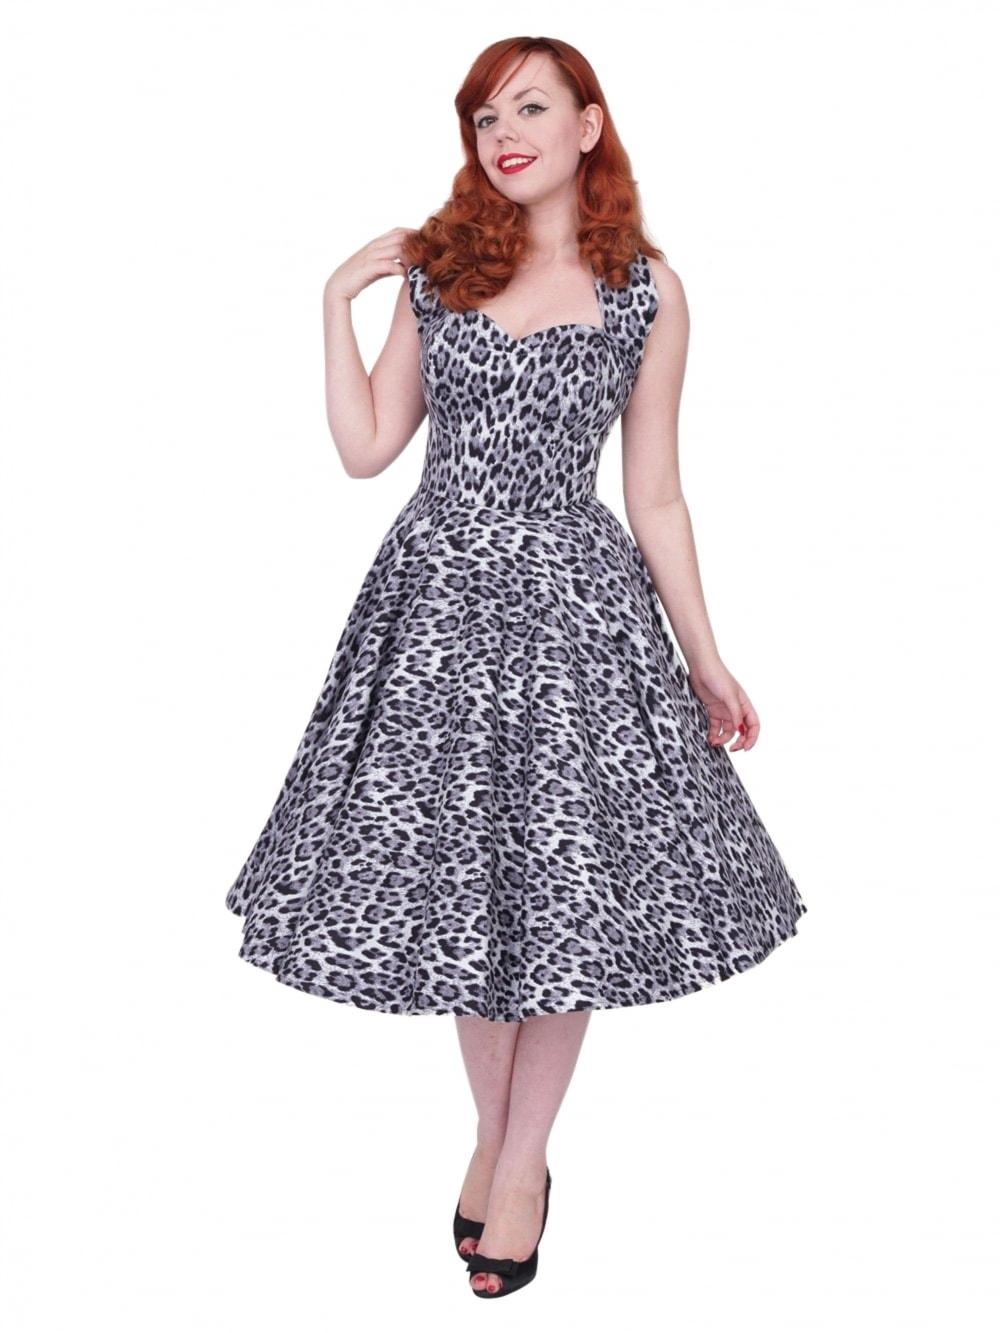 f59f8be5 1950s Halterneck Silver Leopard Dress from Vivien of Holloway